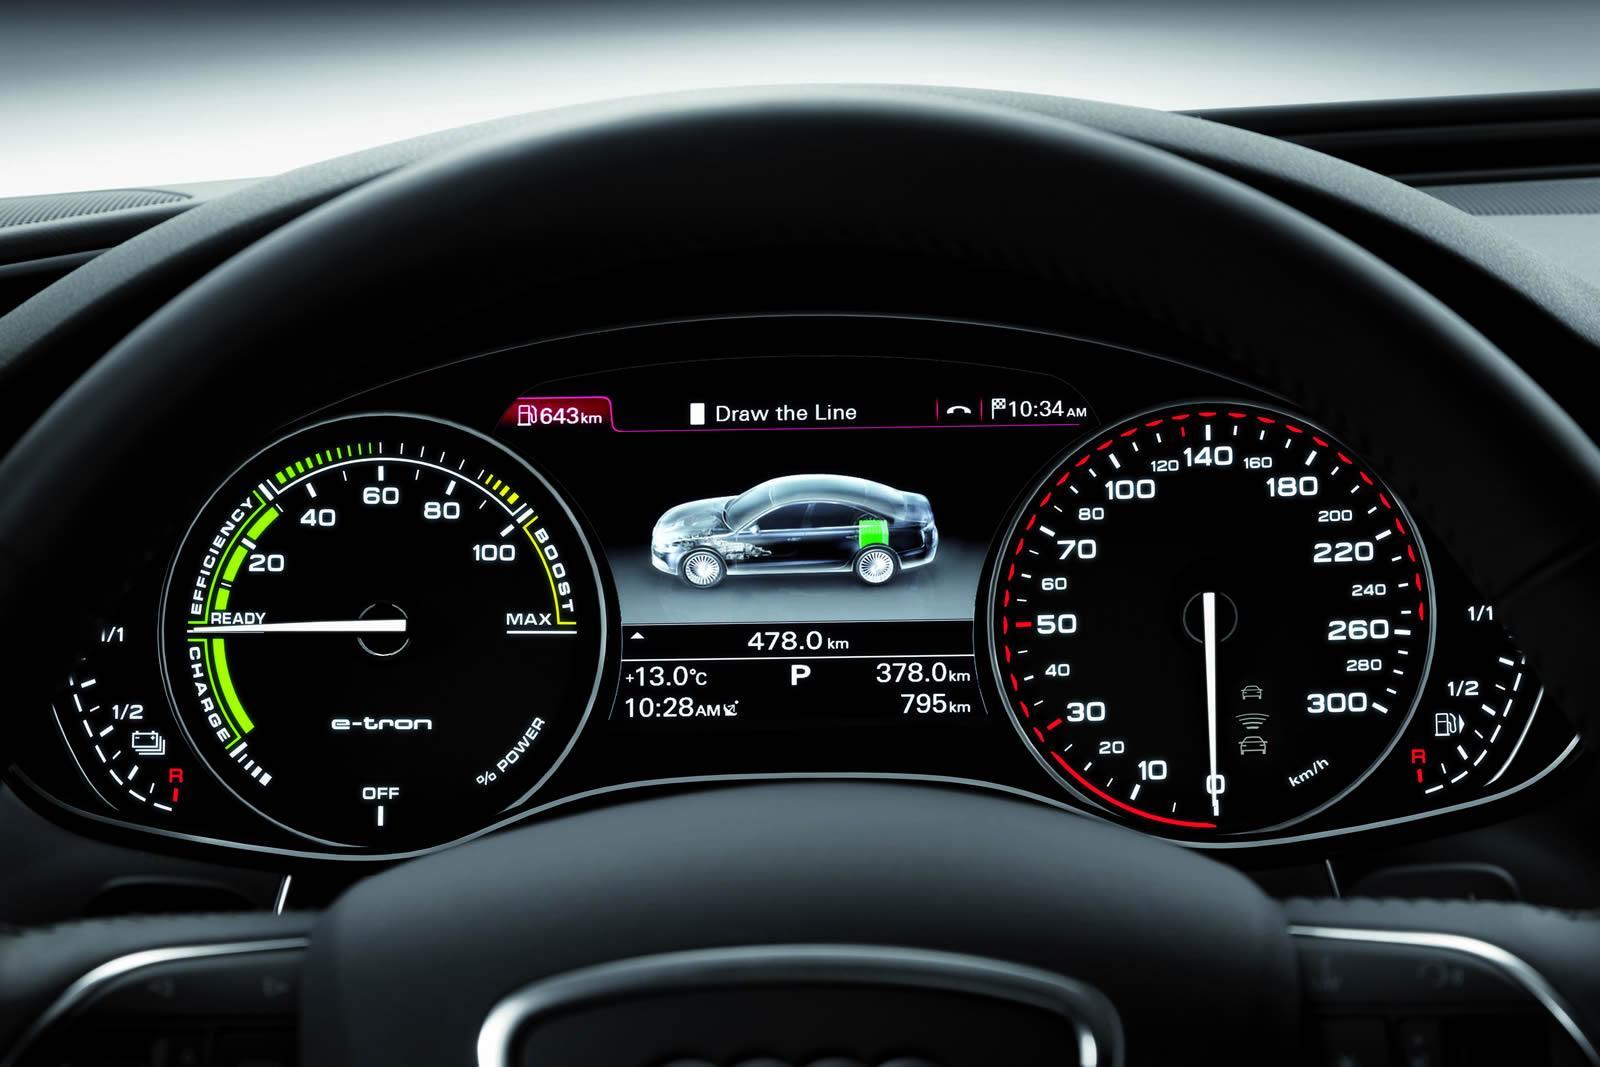 Приборная панель Audi A6 L e-tron 2012 года